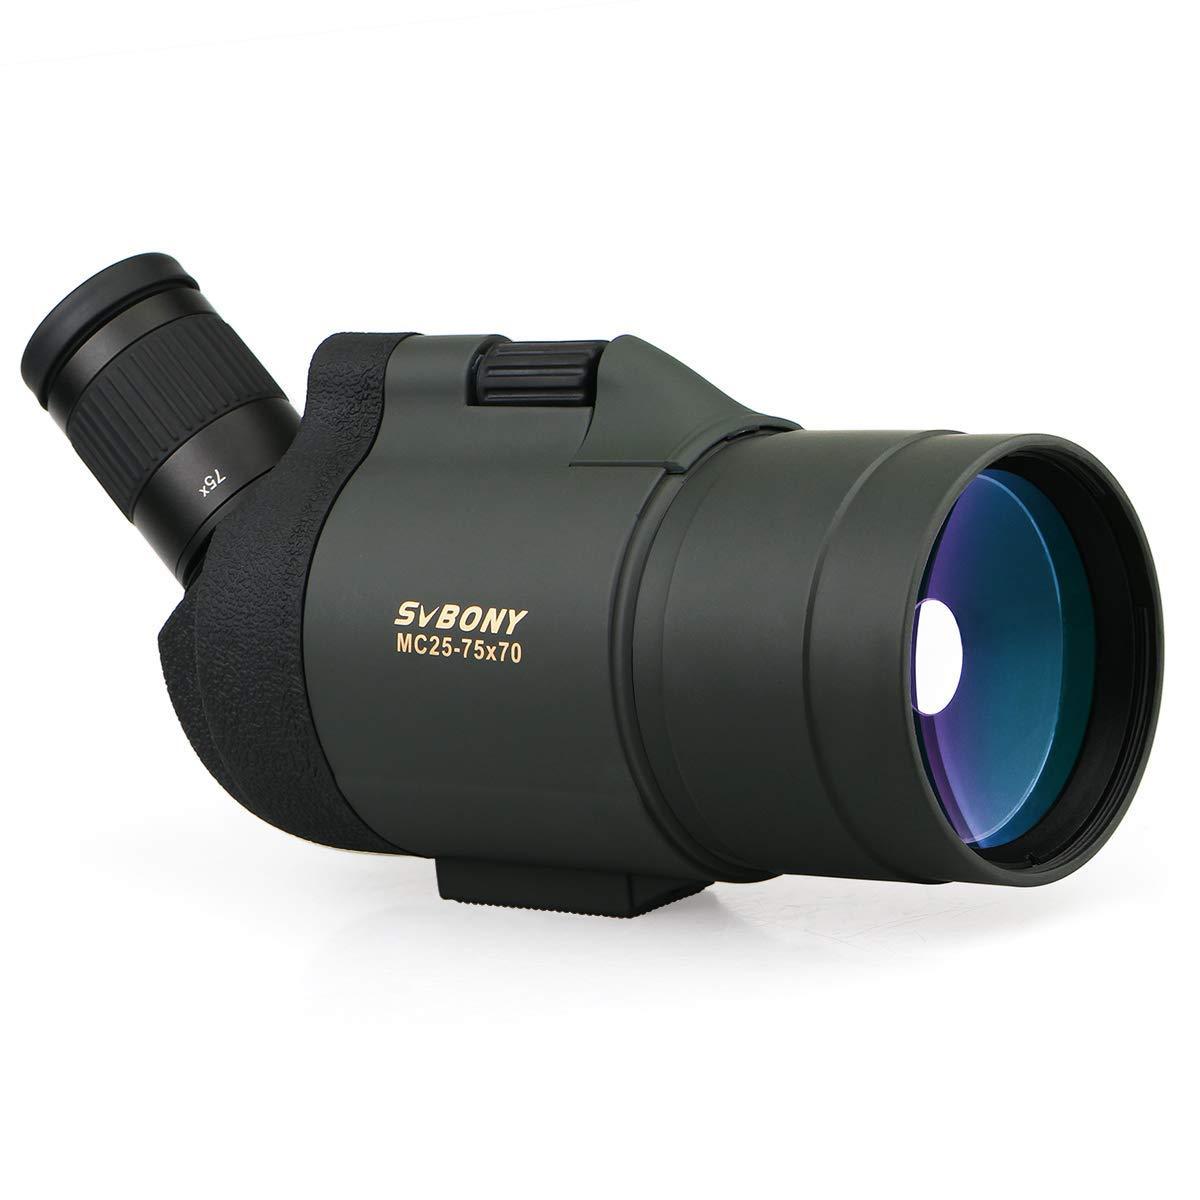 SVBONY SV41 Spotting Scope pic-6